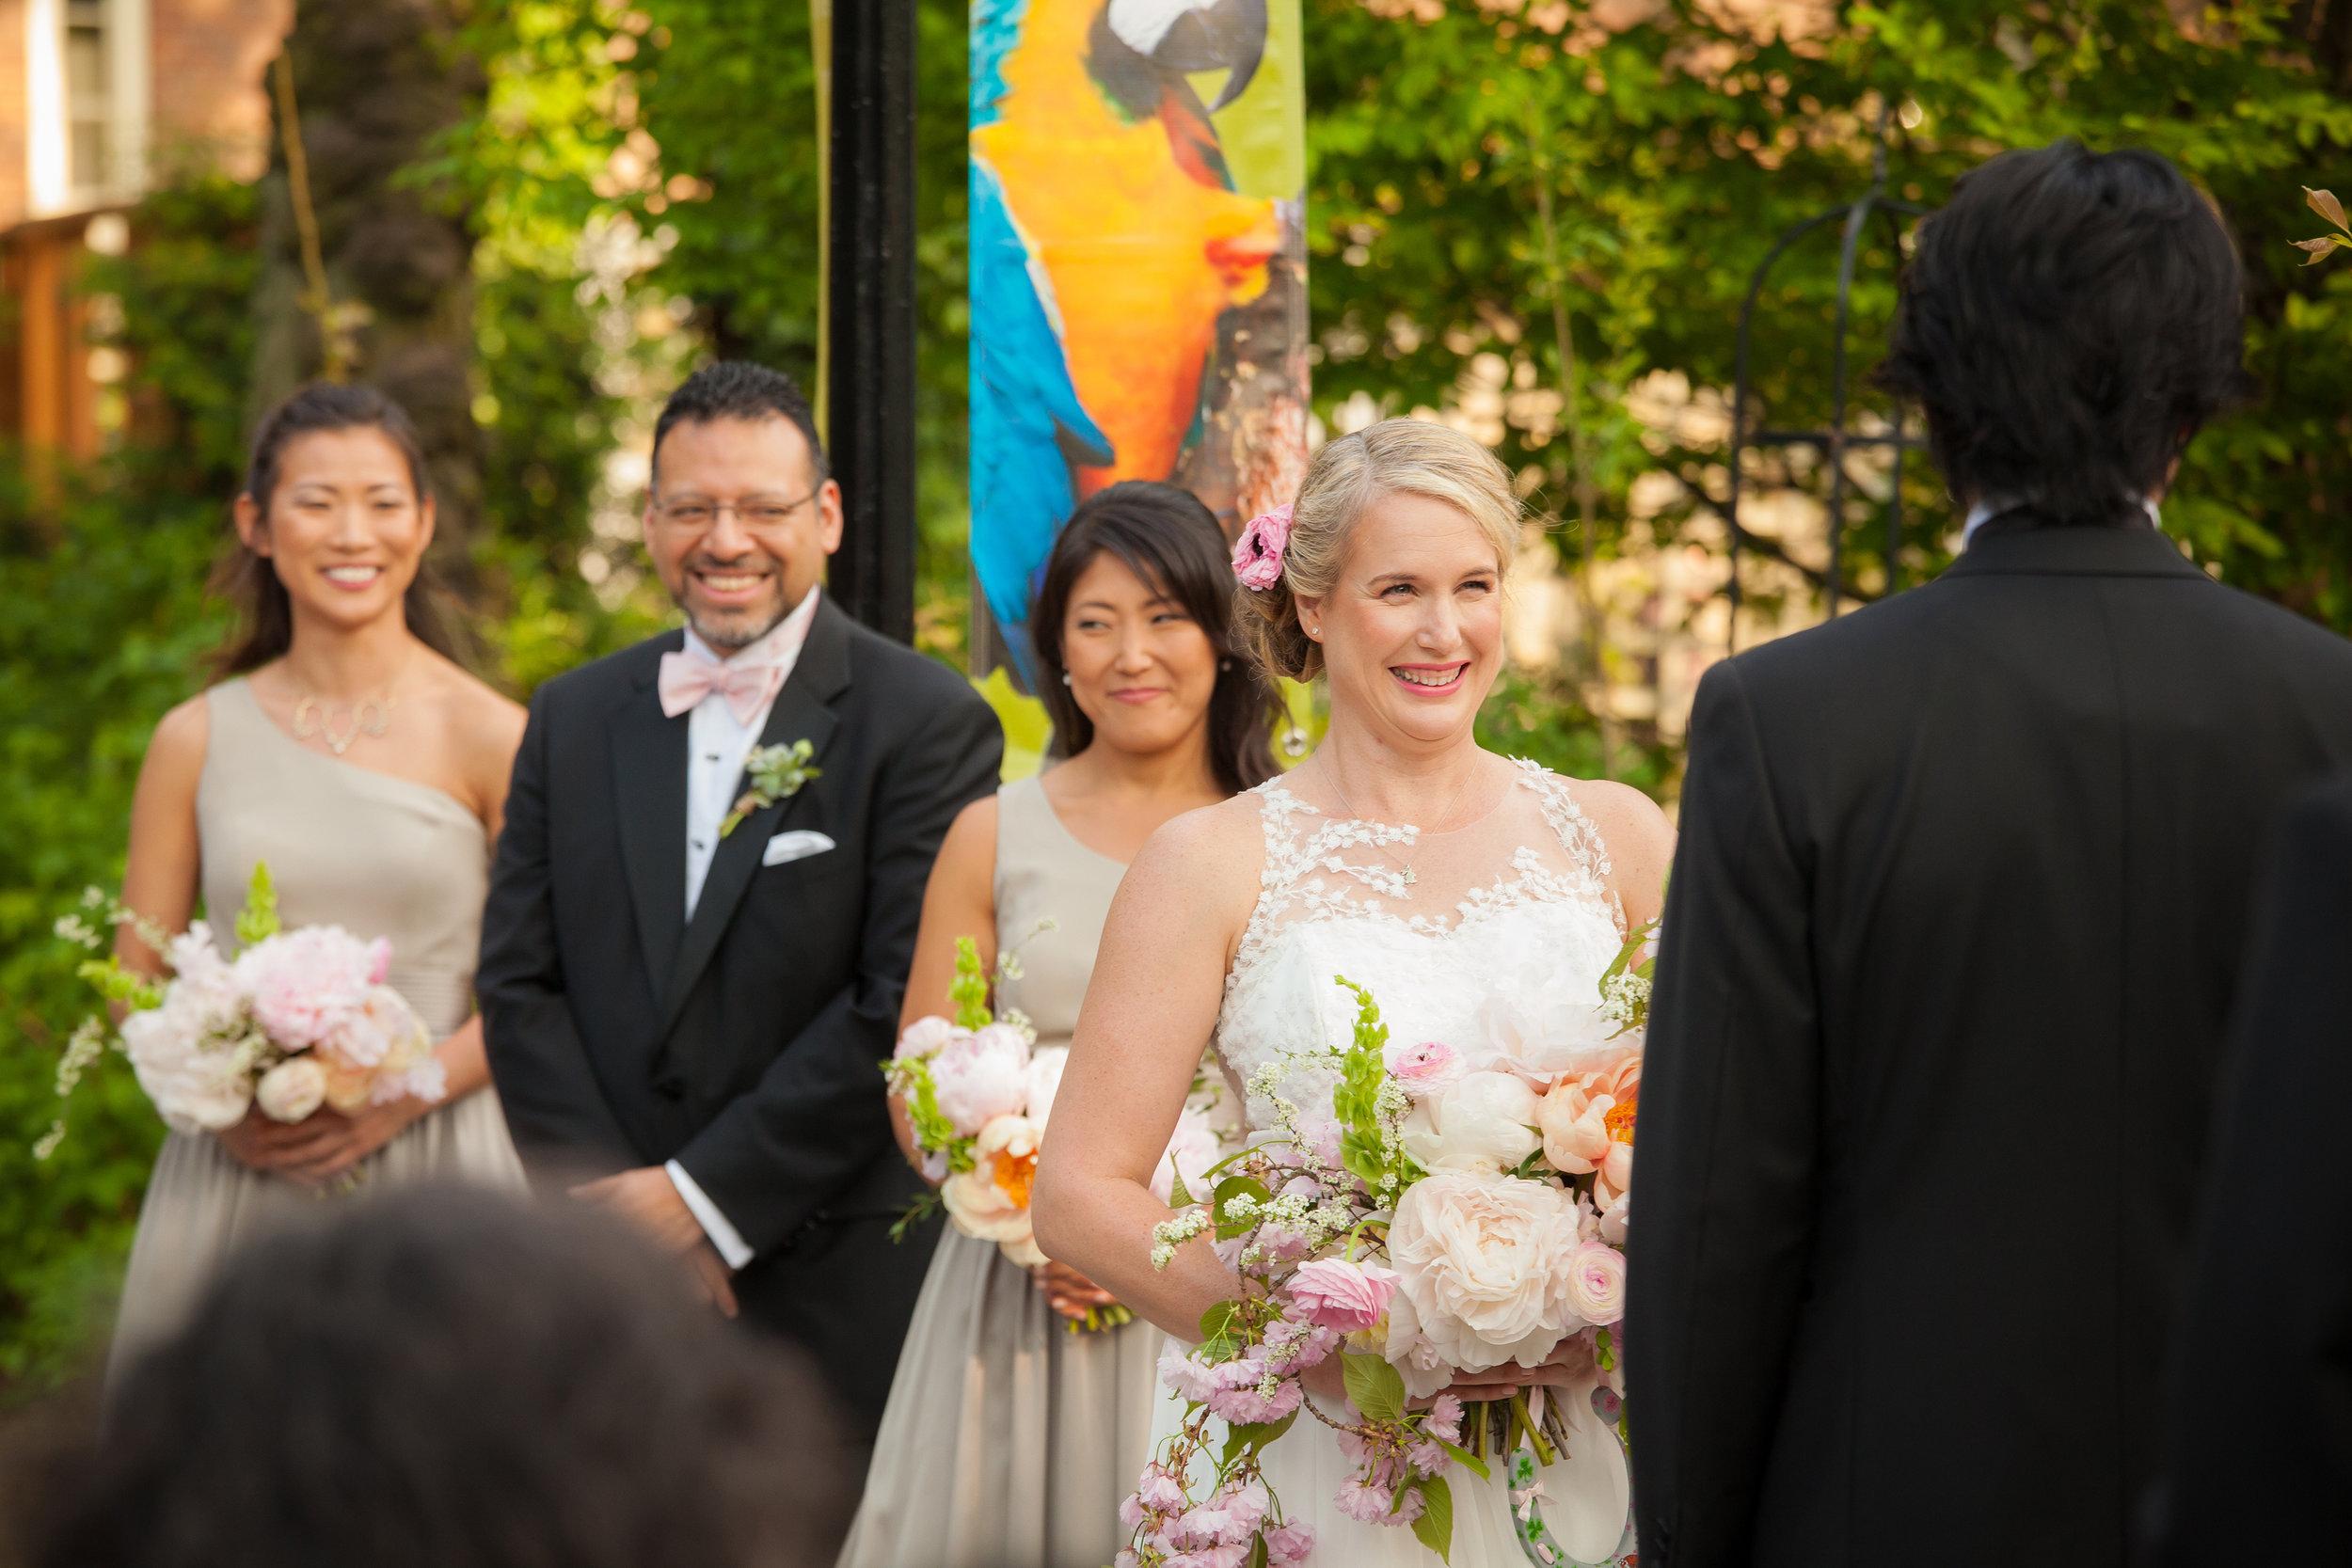 victorious-events-nyc-022-colleen-taka-central-park-zoo-wedding-raymond-hamlin.jpg